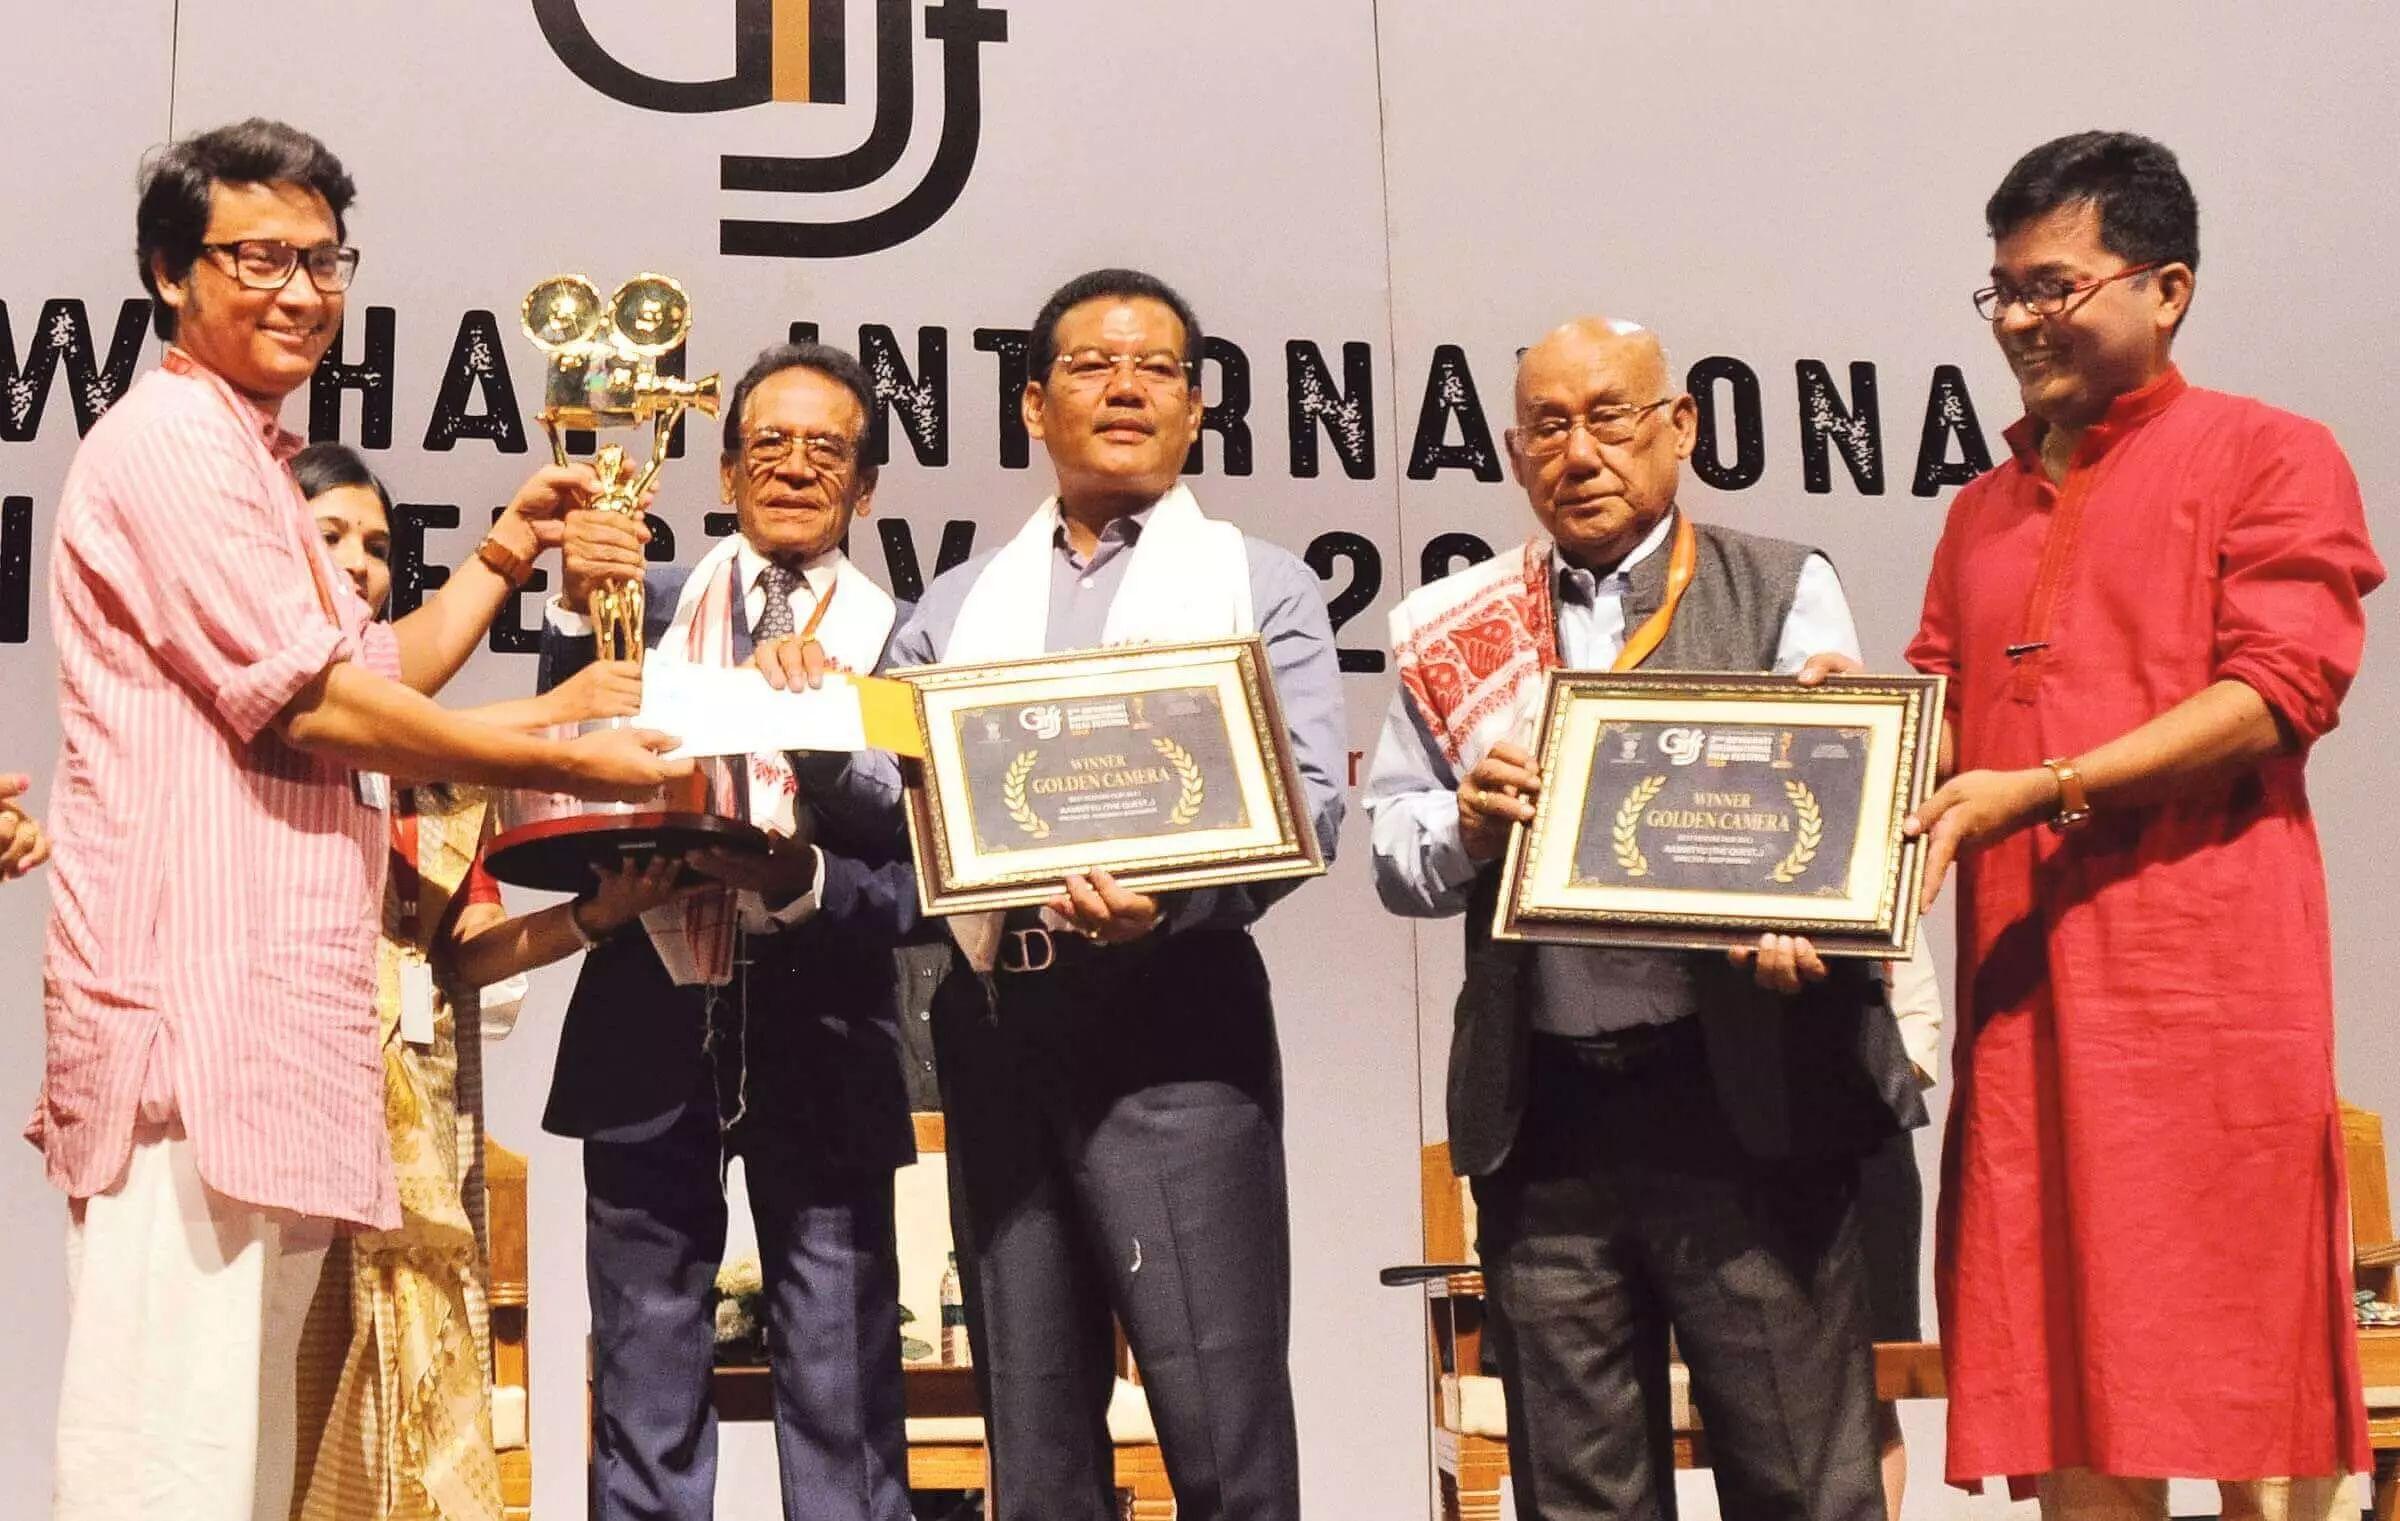 Guwahati International Film Festival (GIFF) takes the curtain call